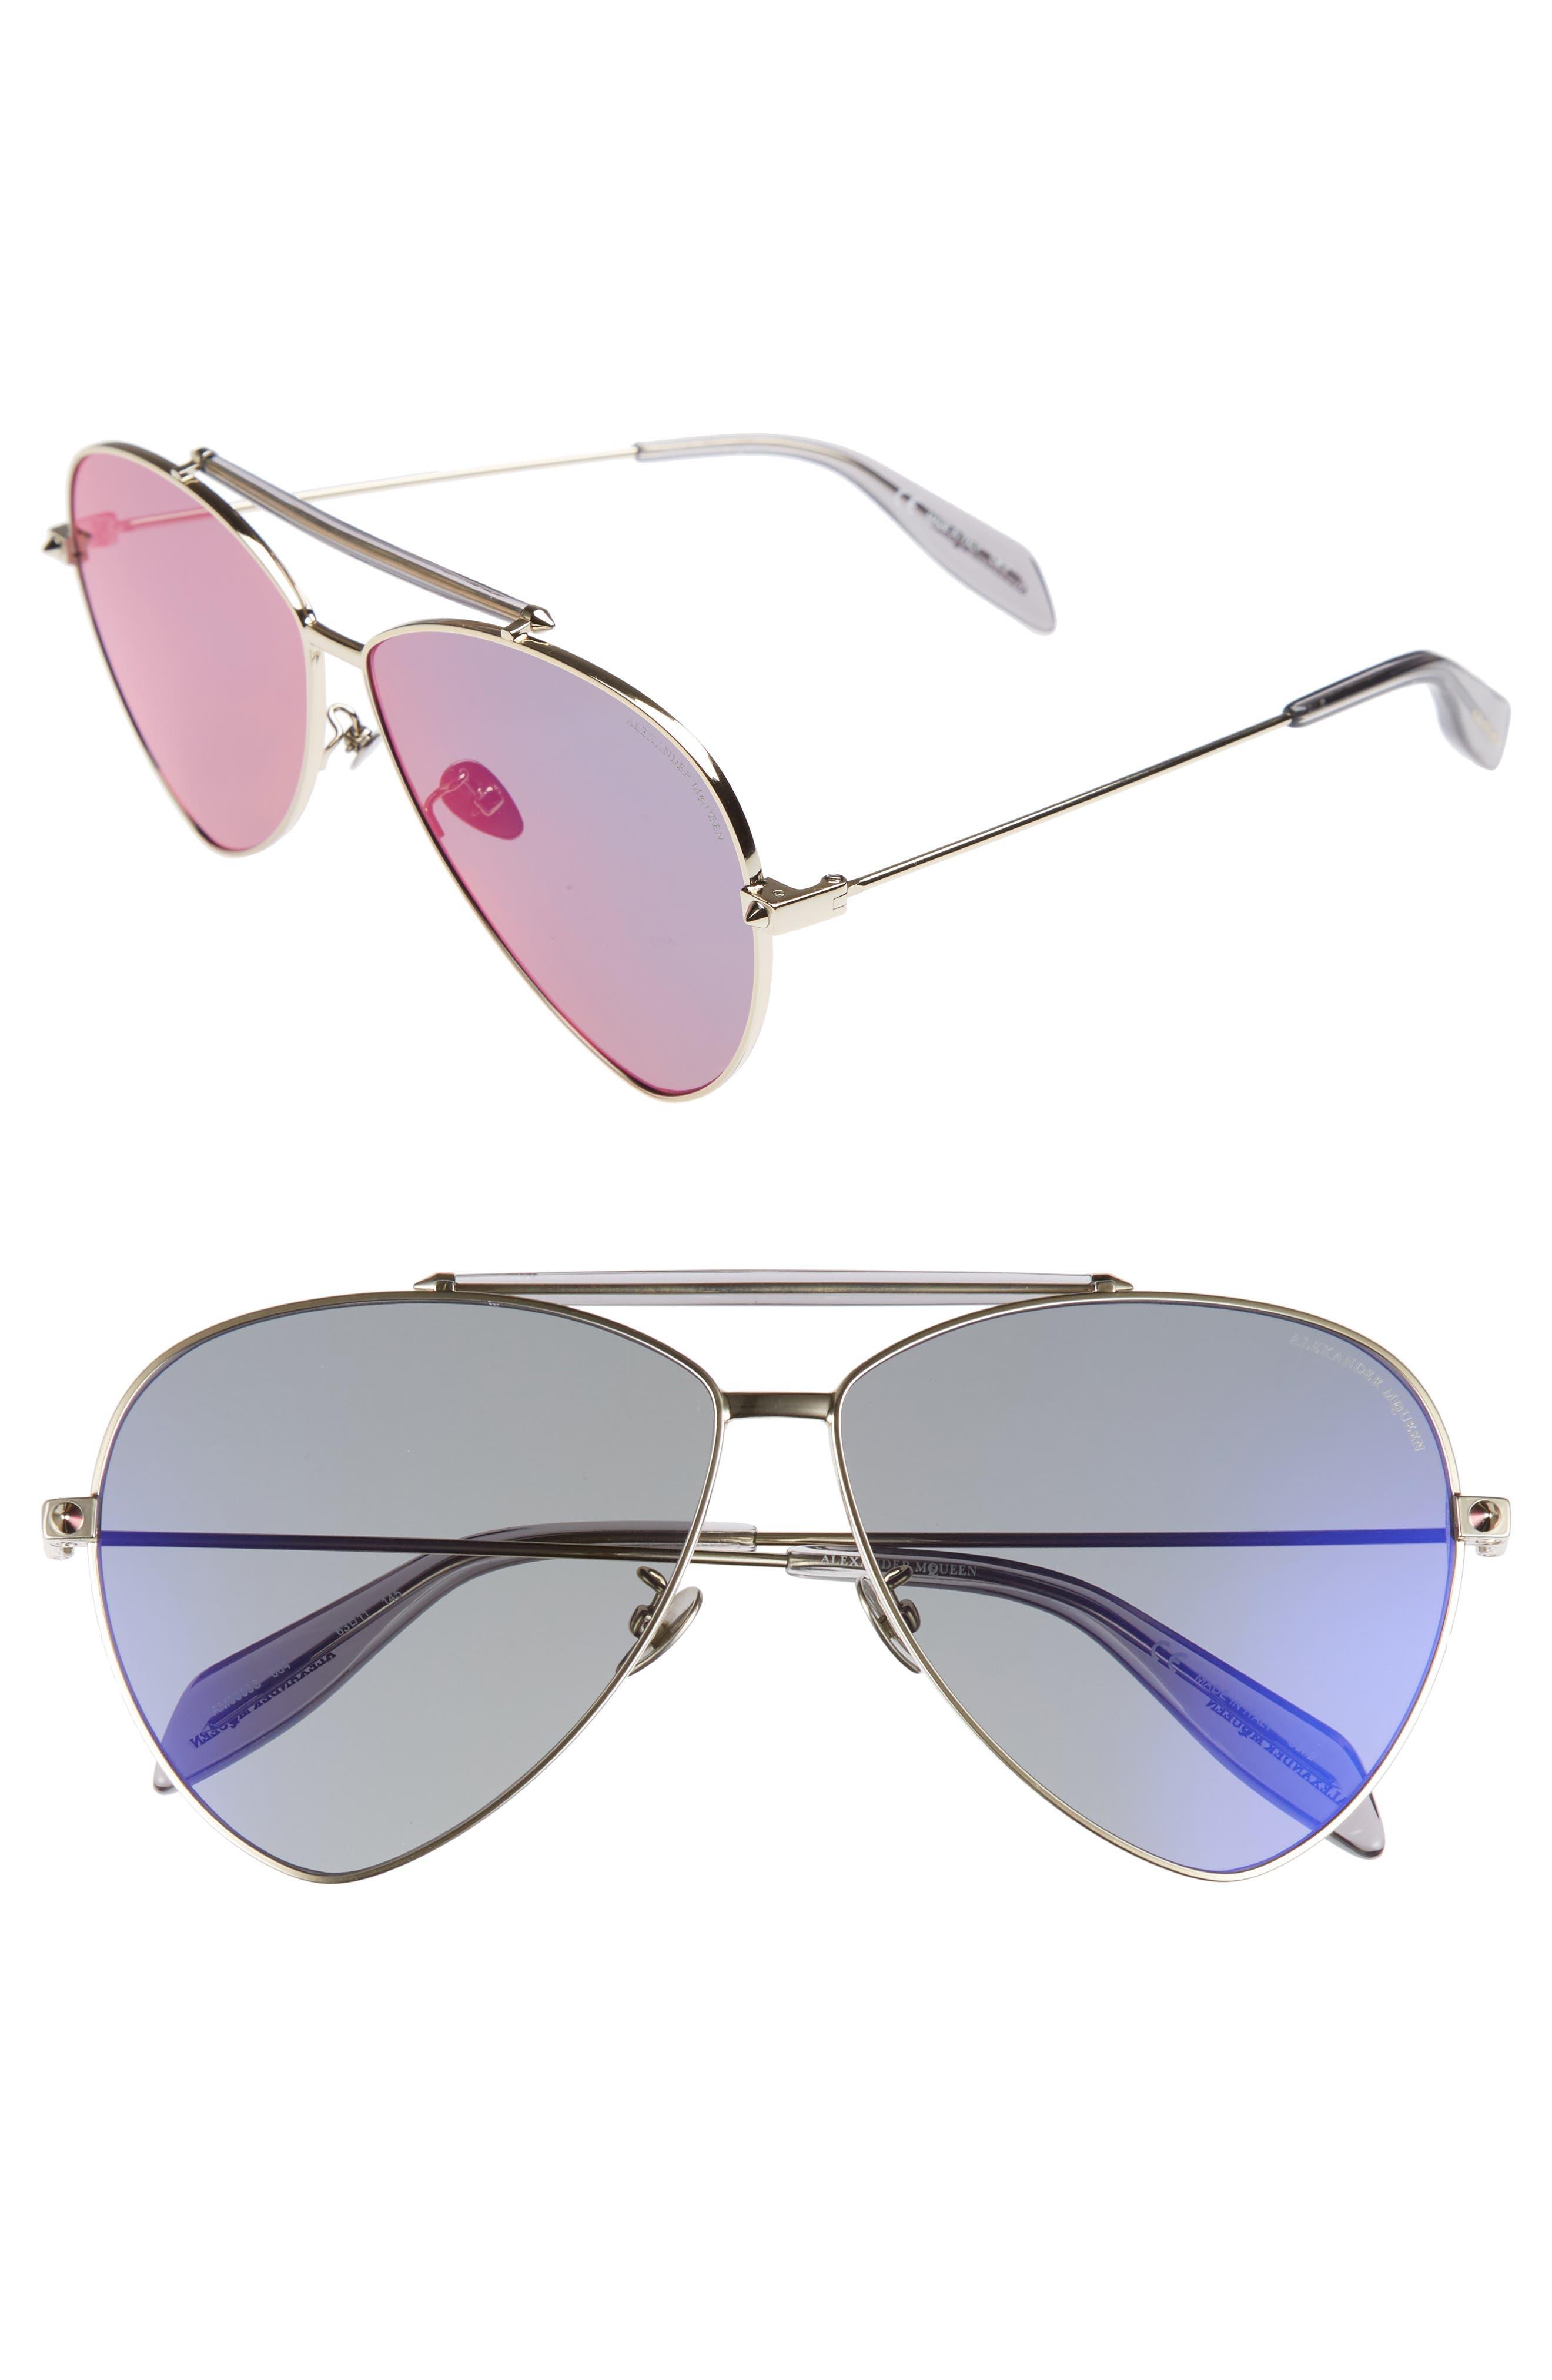 63mm Oversize Aviator Sunglasses,                             Main thumbnail 2, color,